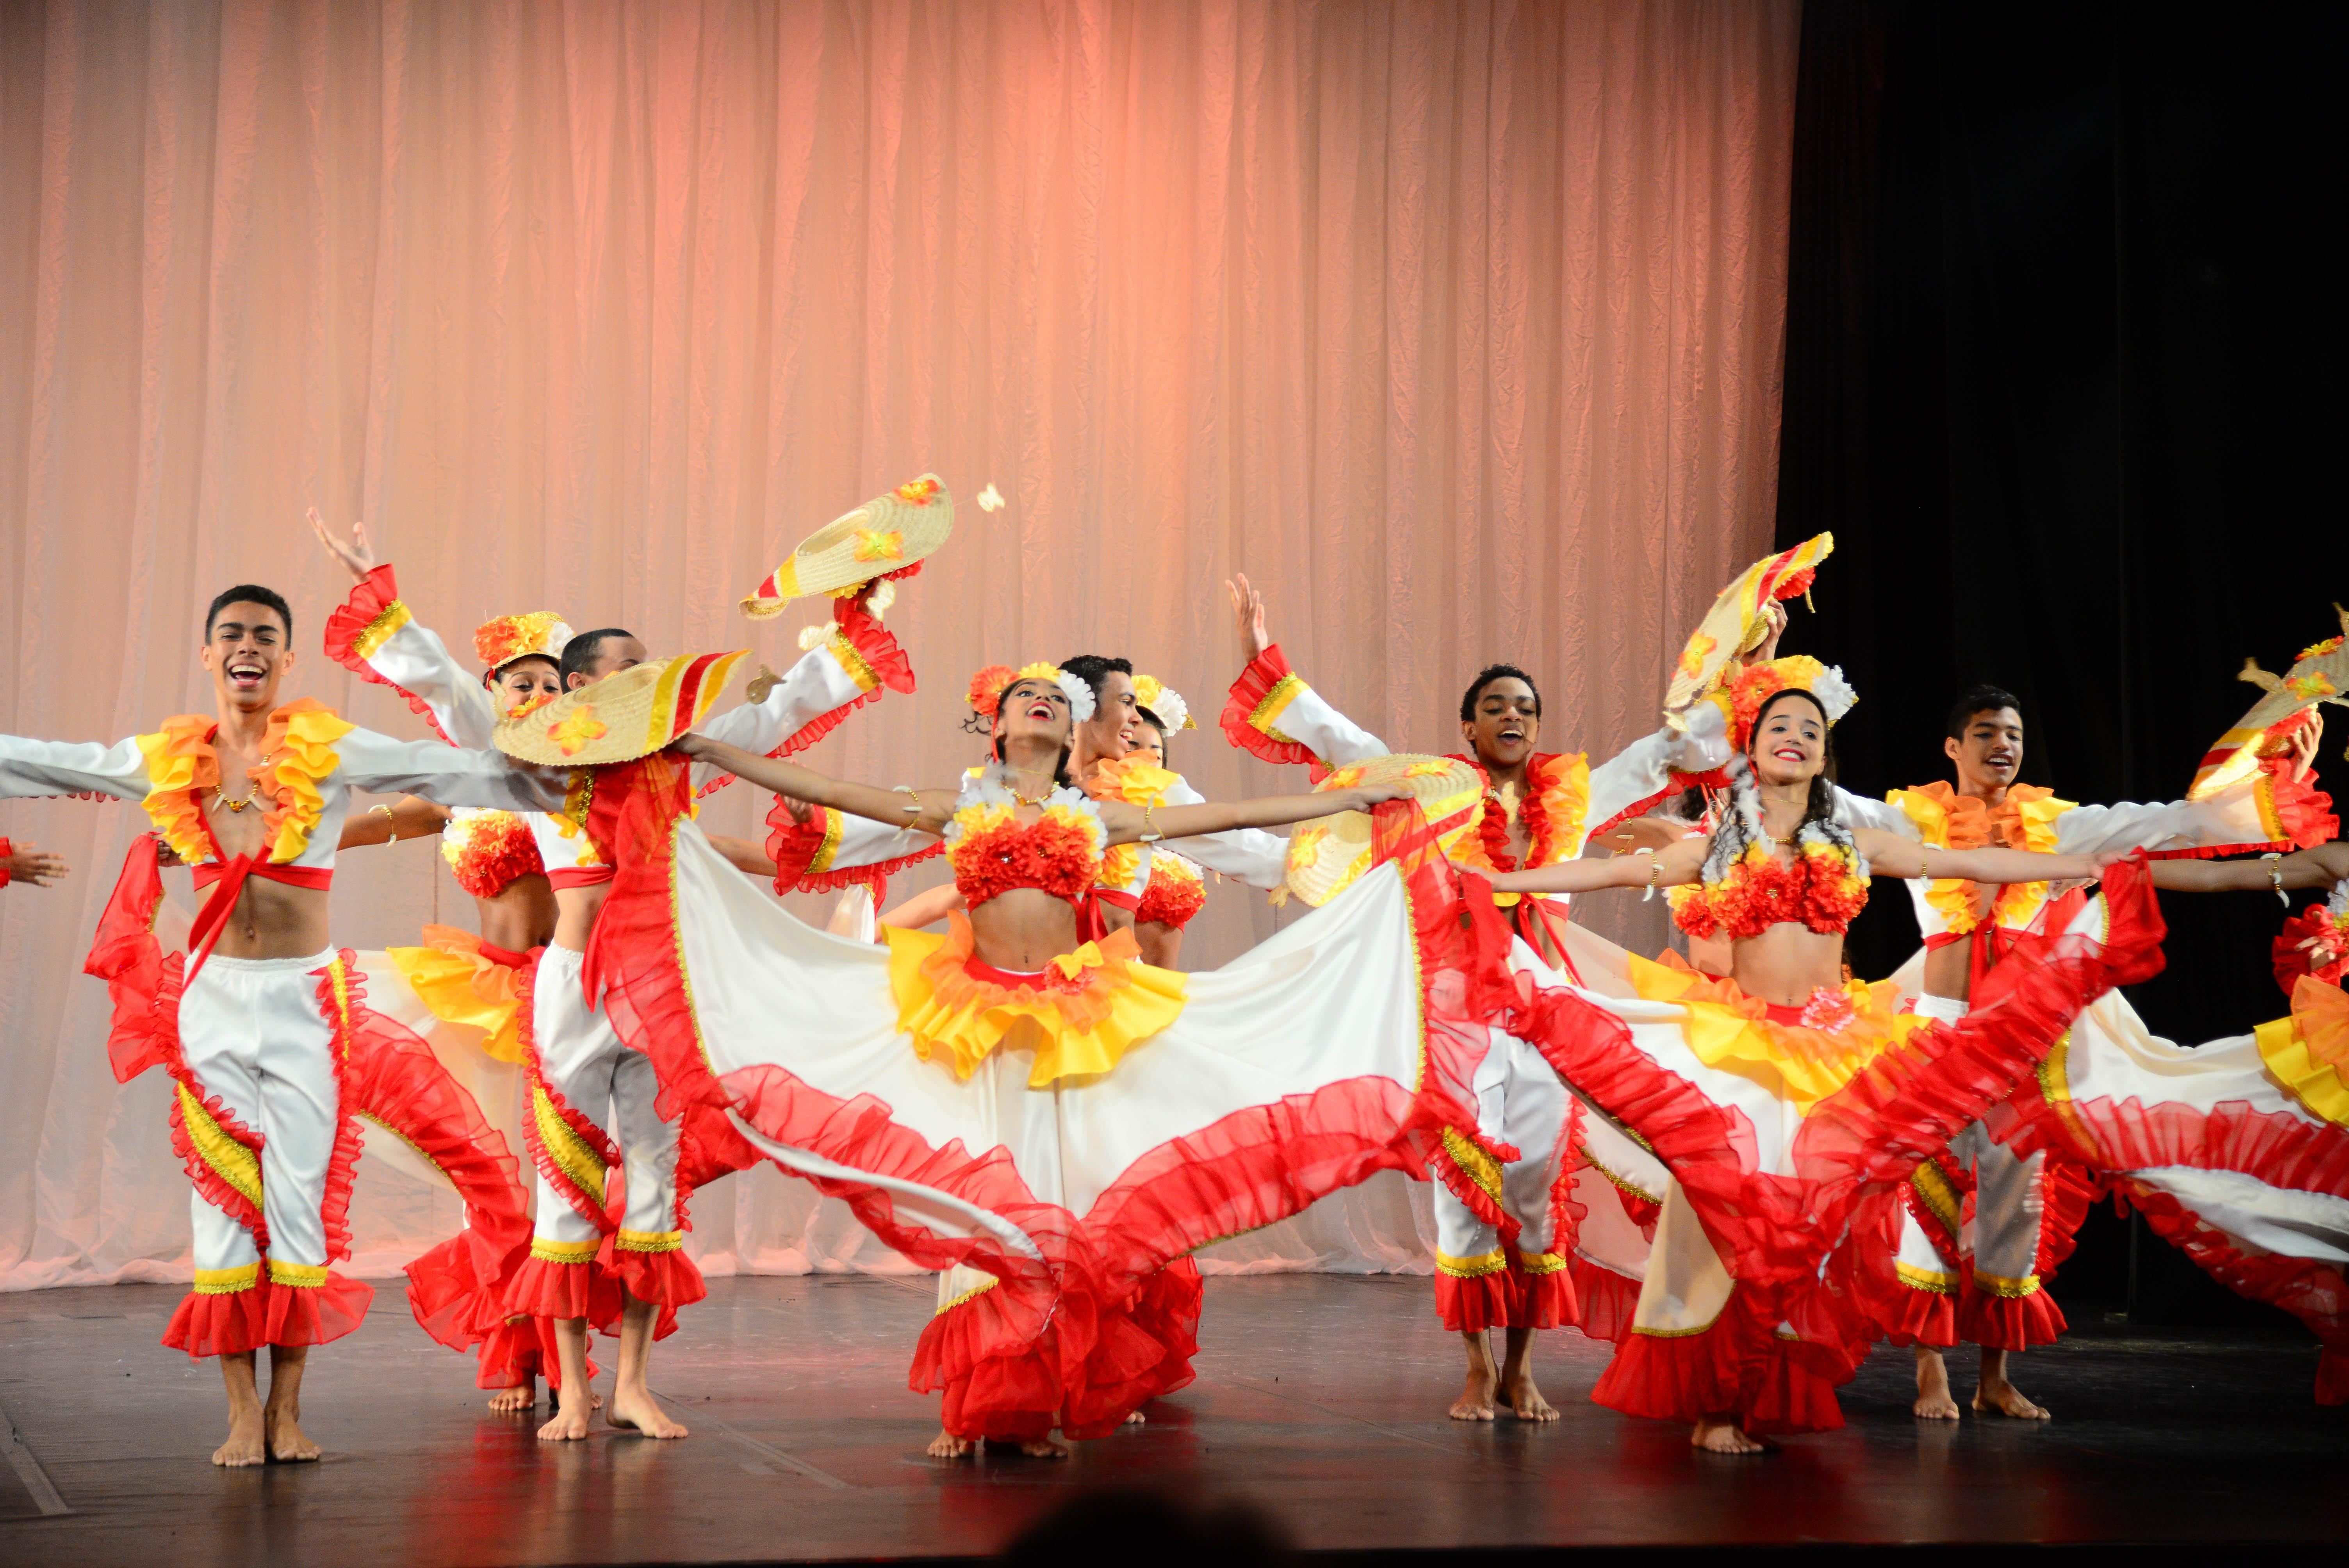 Beto Carrero World e Bolshoi Brasil se unem no Dia Mundial da Dança